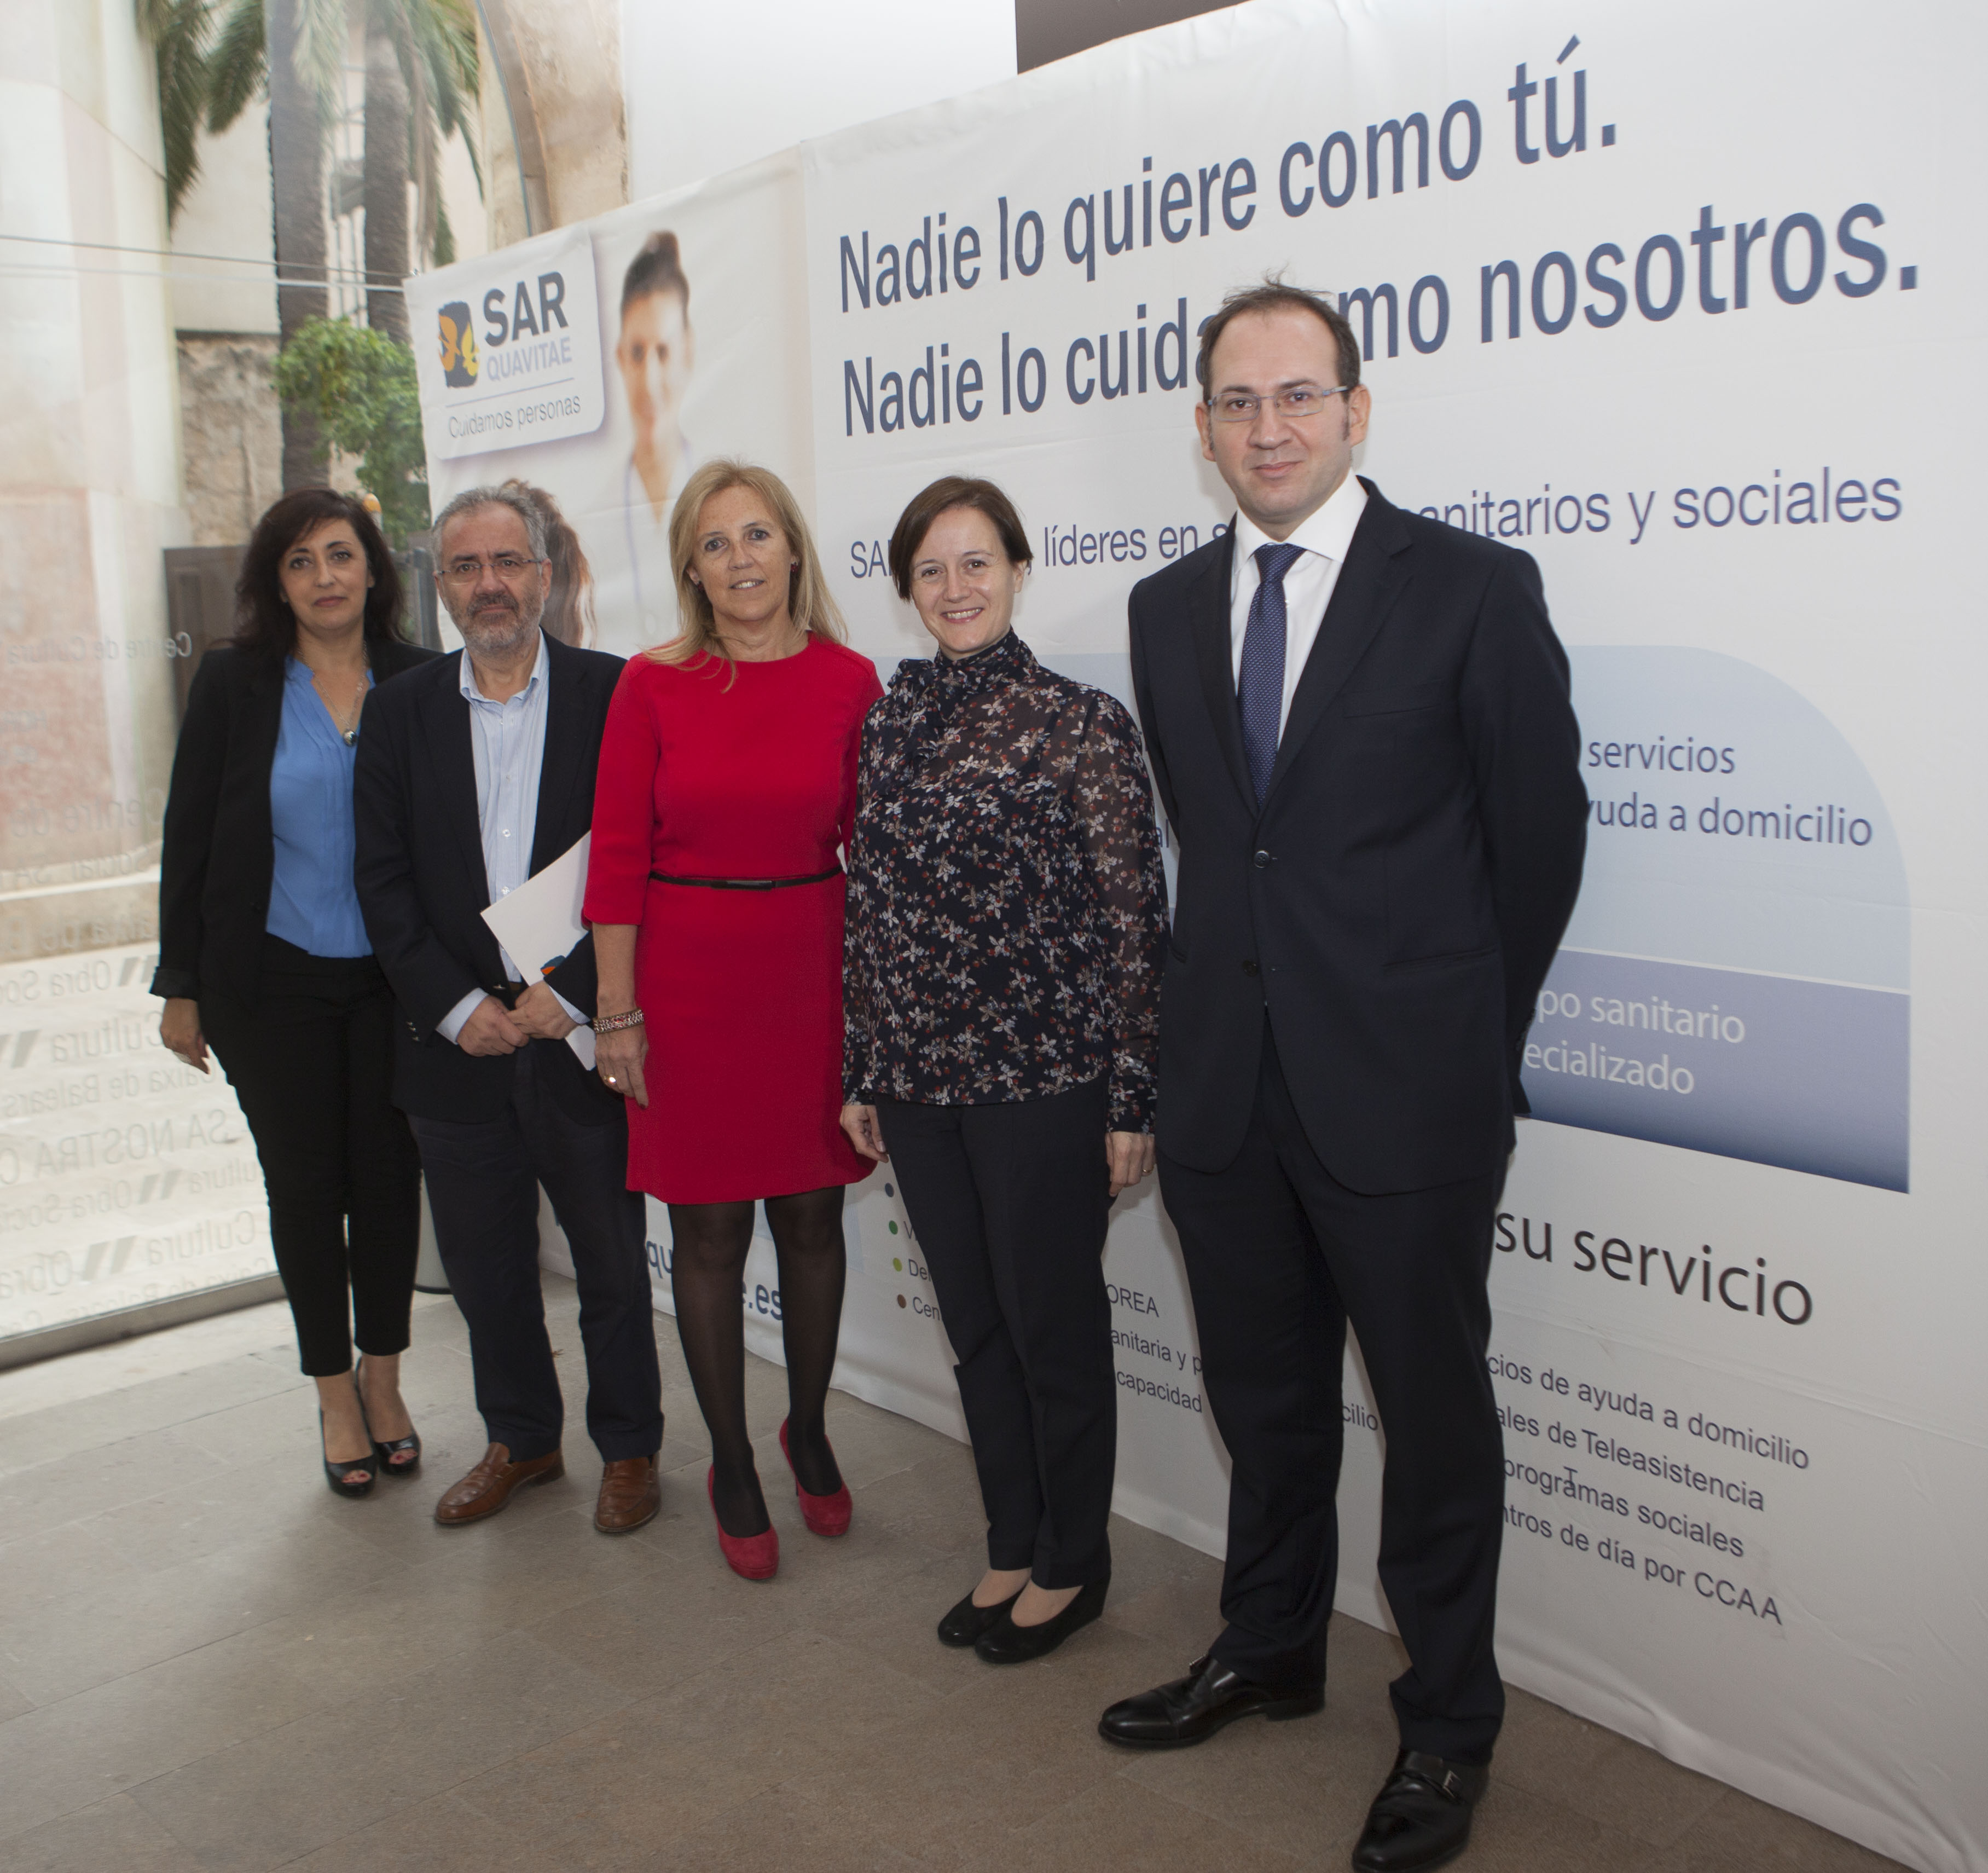 14-10-2014 Jornada SarQuavitae Palma de Mallorca 2